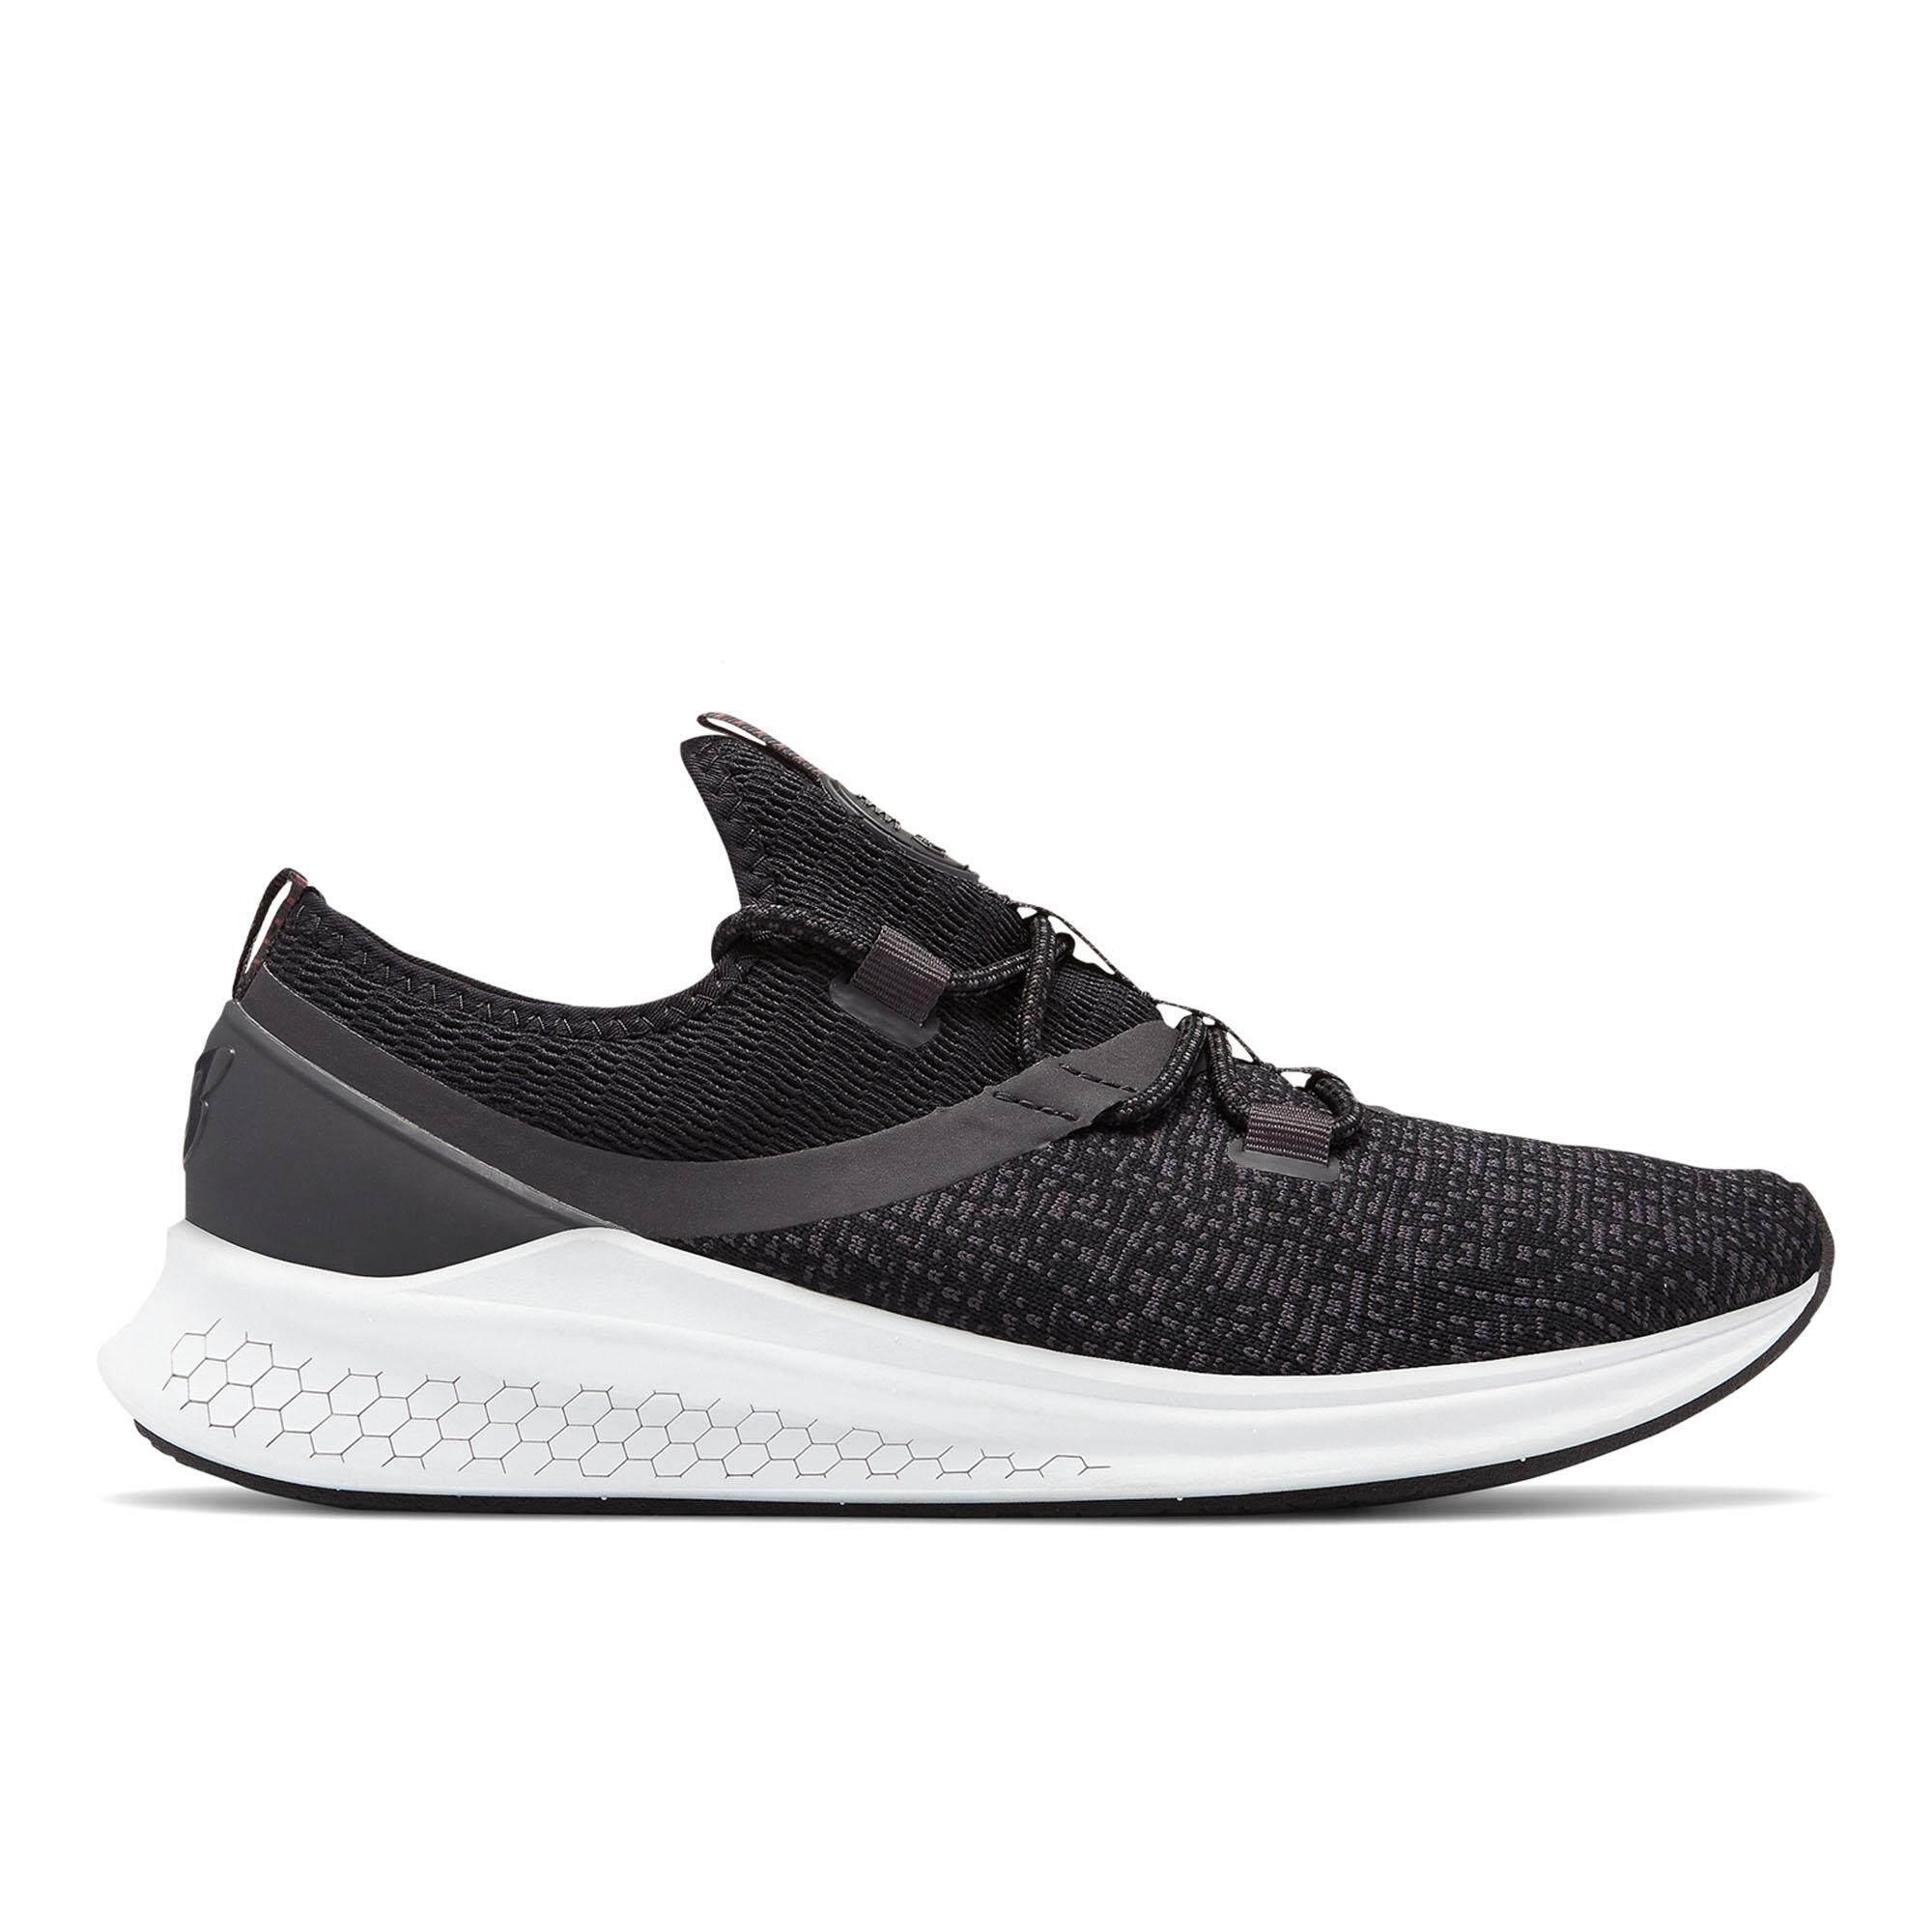 4f355fca4f New Balance Women's Performance Shoes - Lazr (Grey)